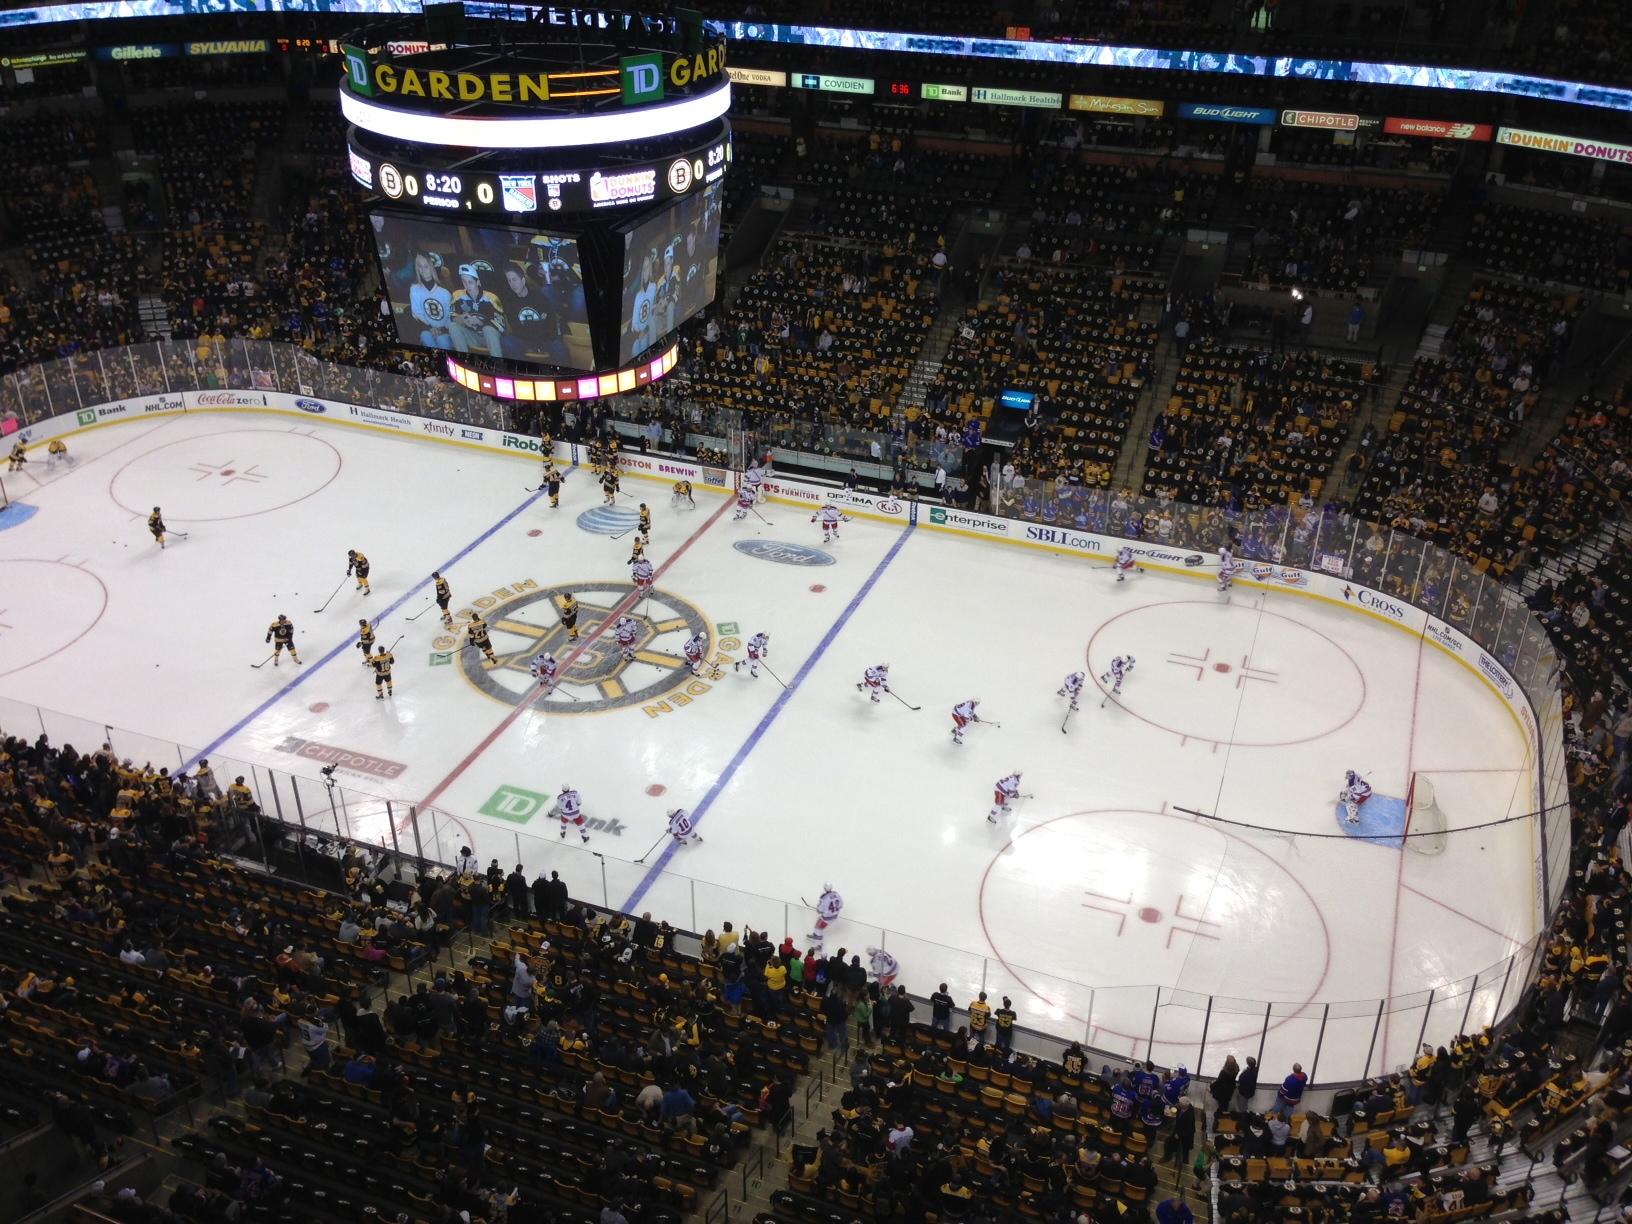 Final Bruins 3 Rangers 1 Bruins Blog Boston Globe Hockey News